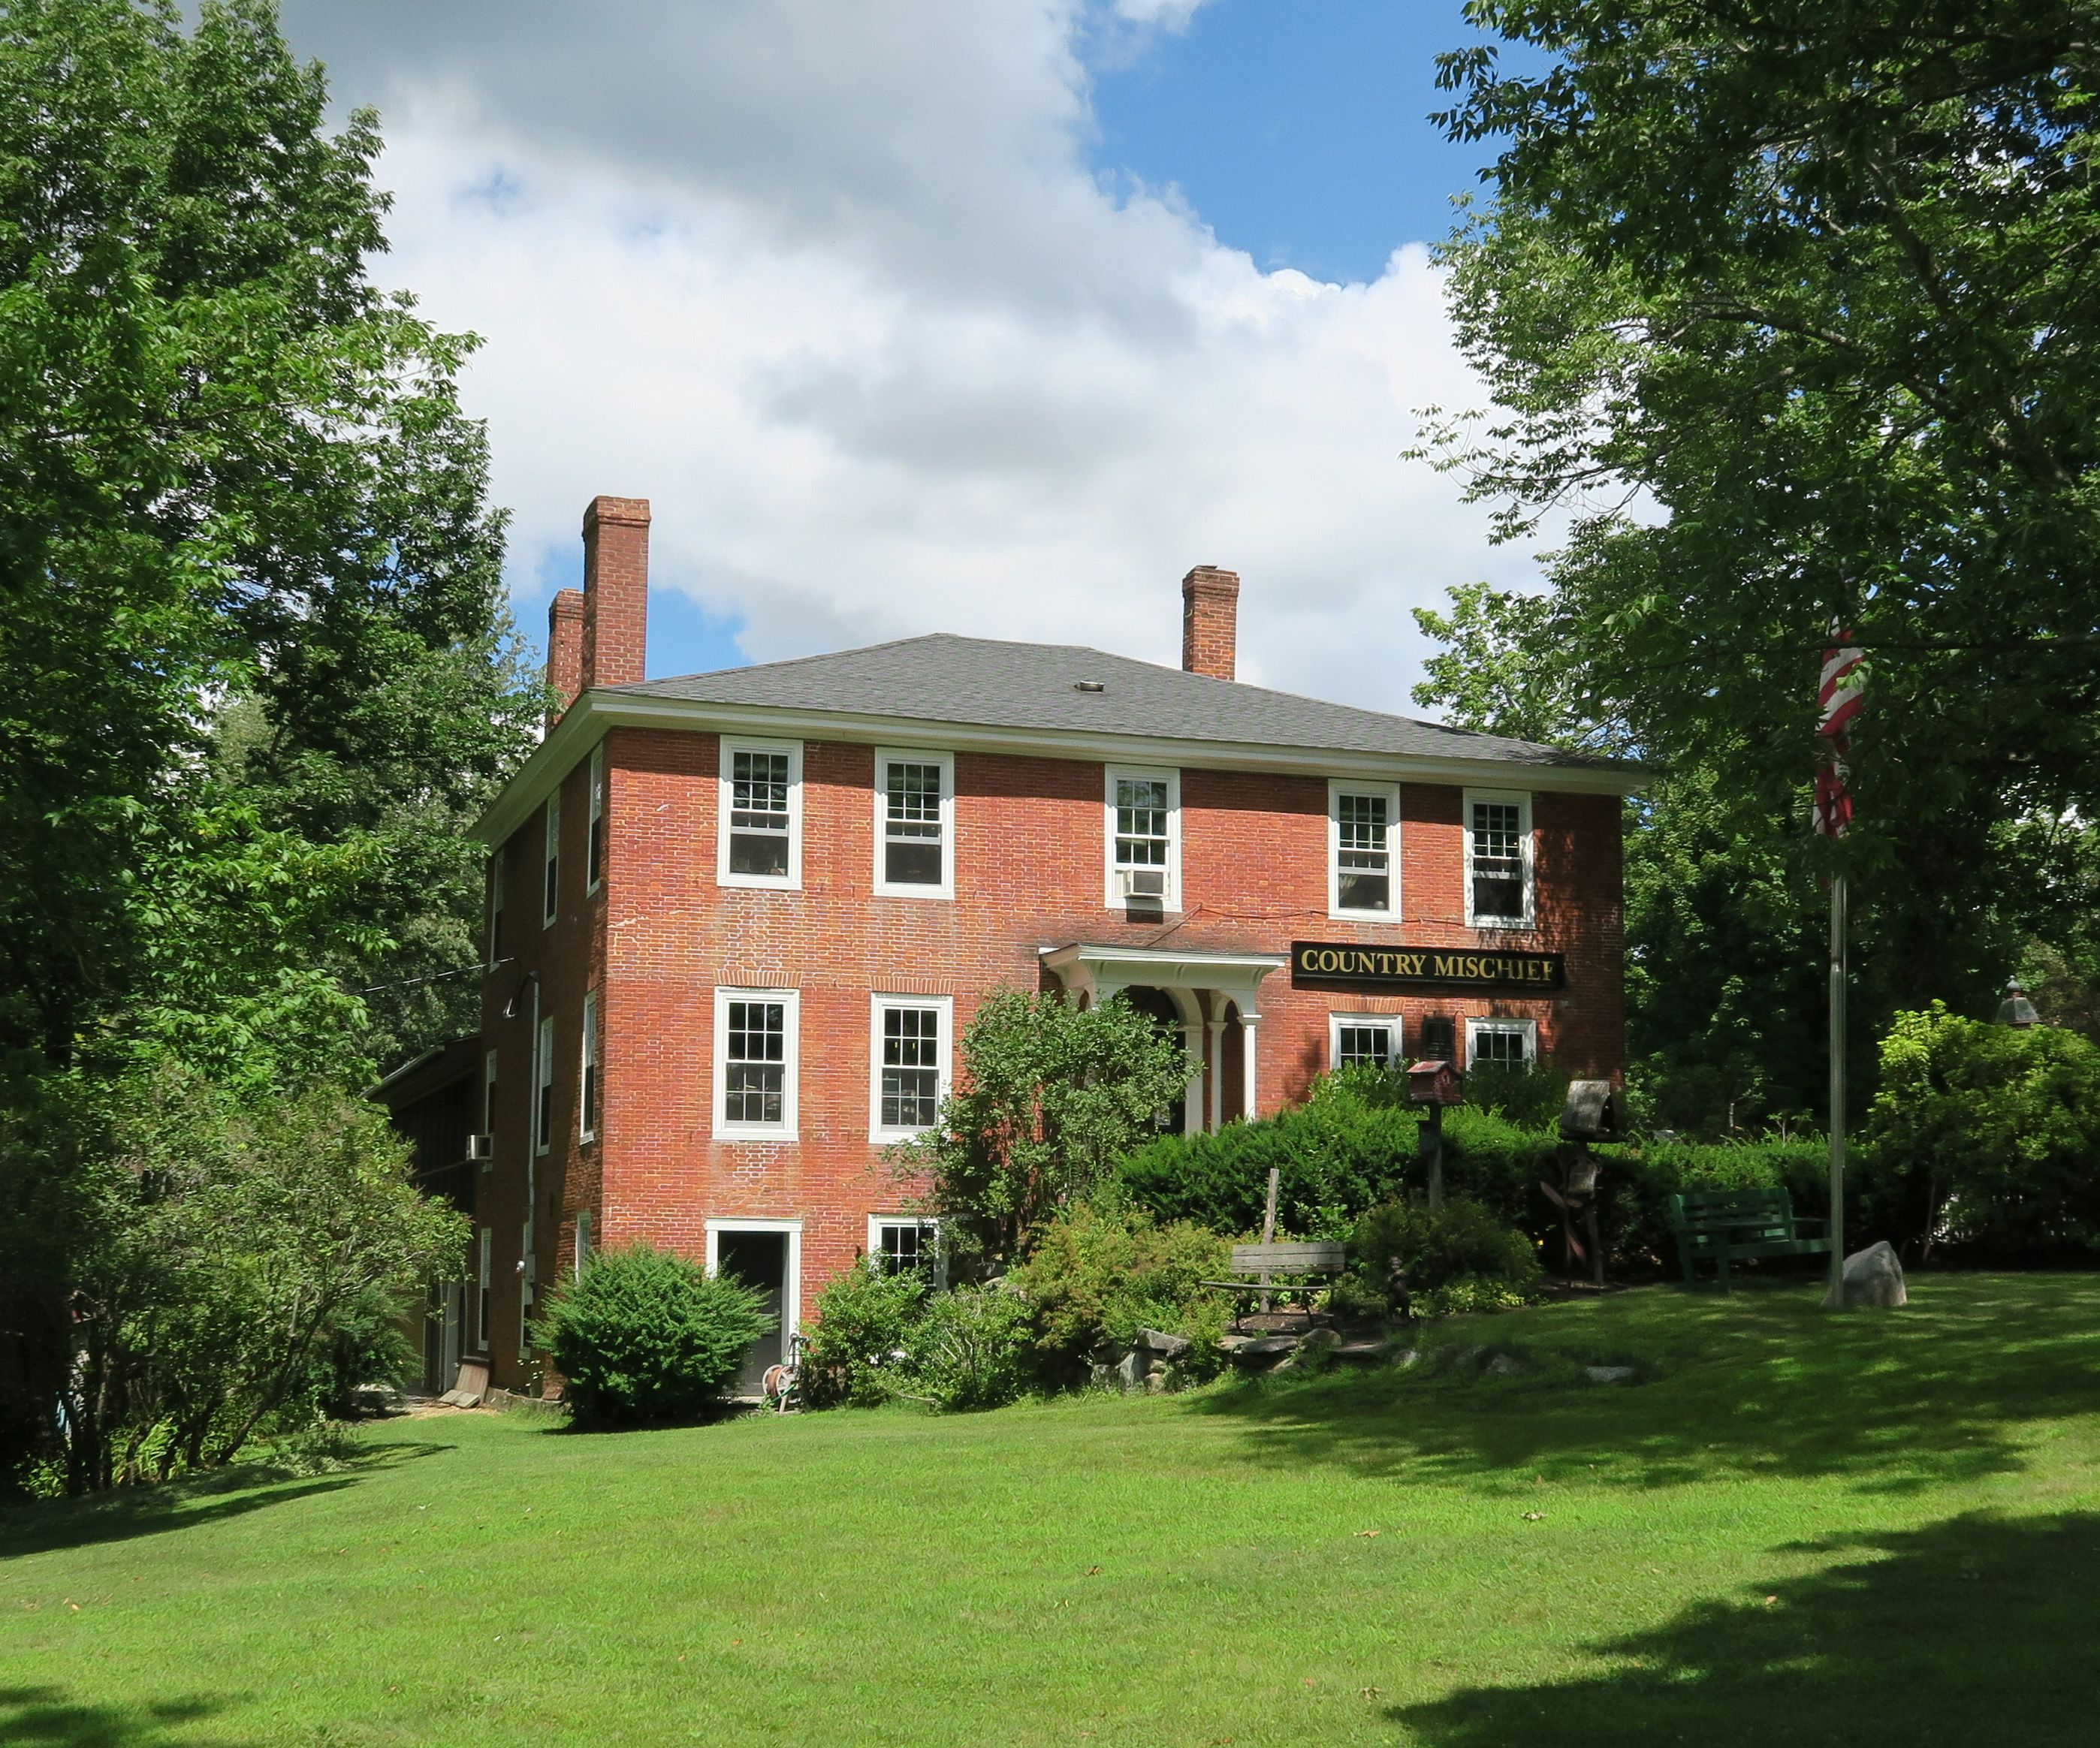 Country Mischief in Templeton, Massachusetts